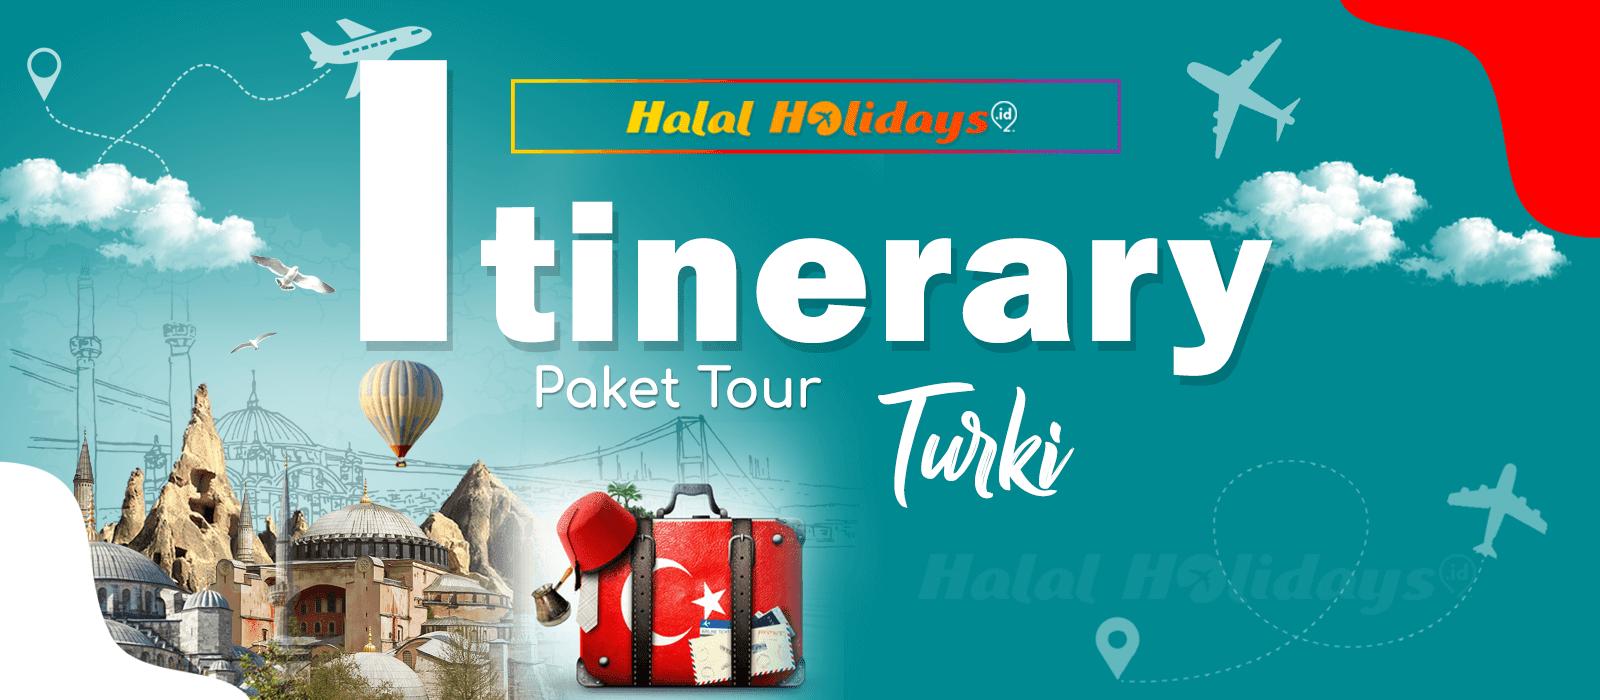 Itinerary Paket Tour Halal Turki 10 Hari